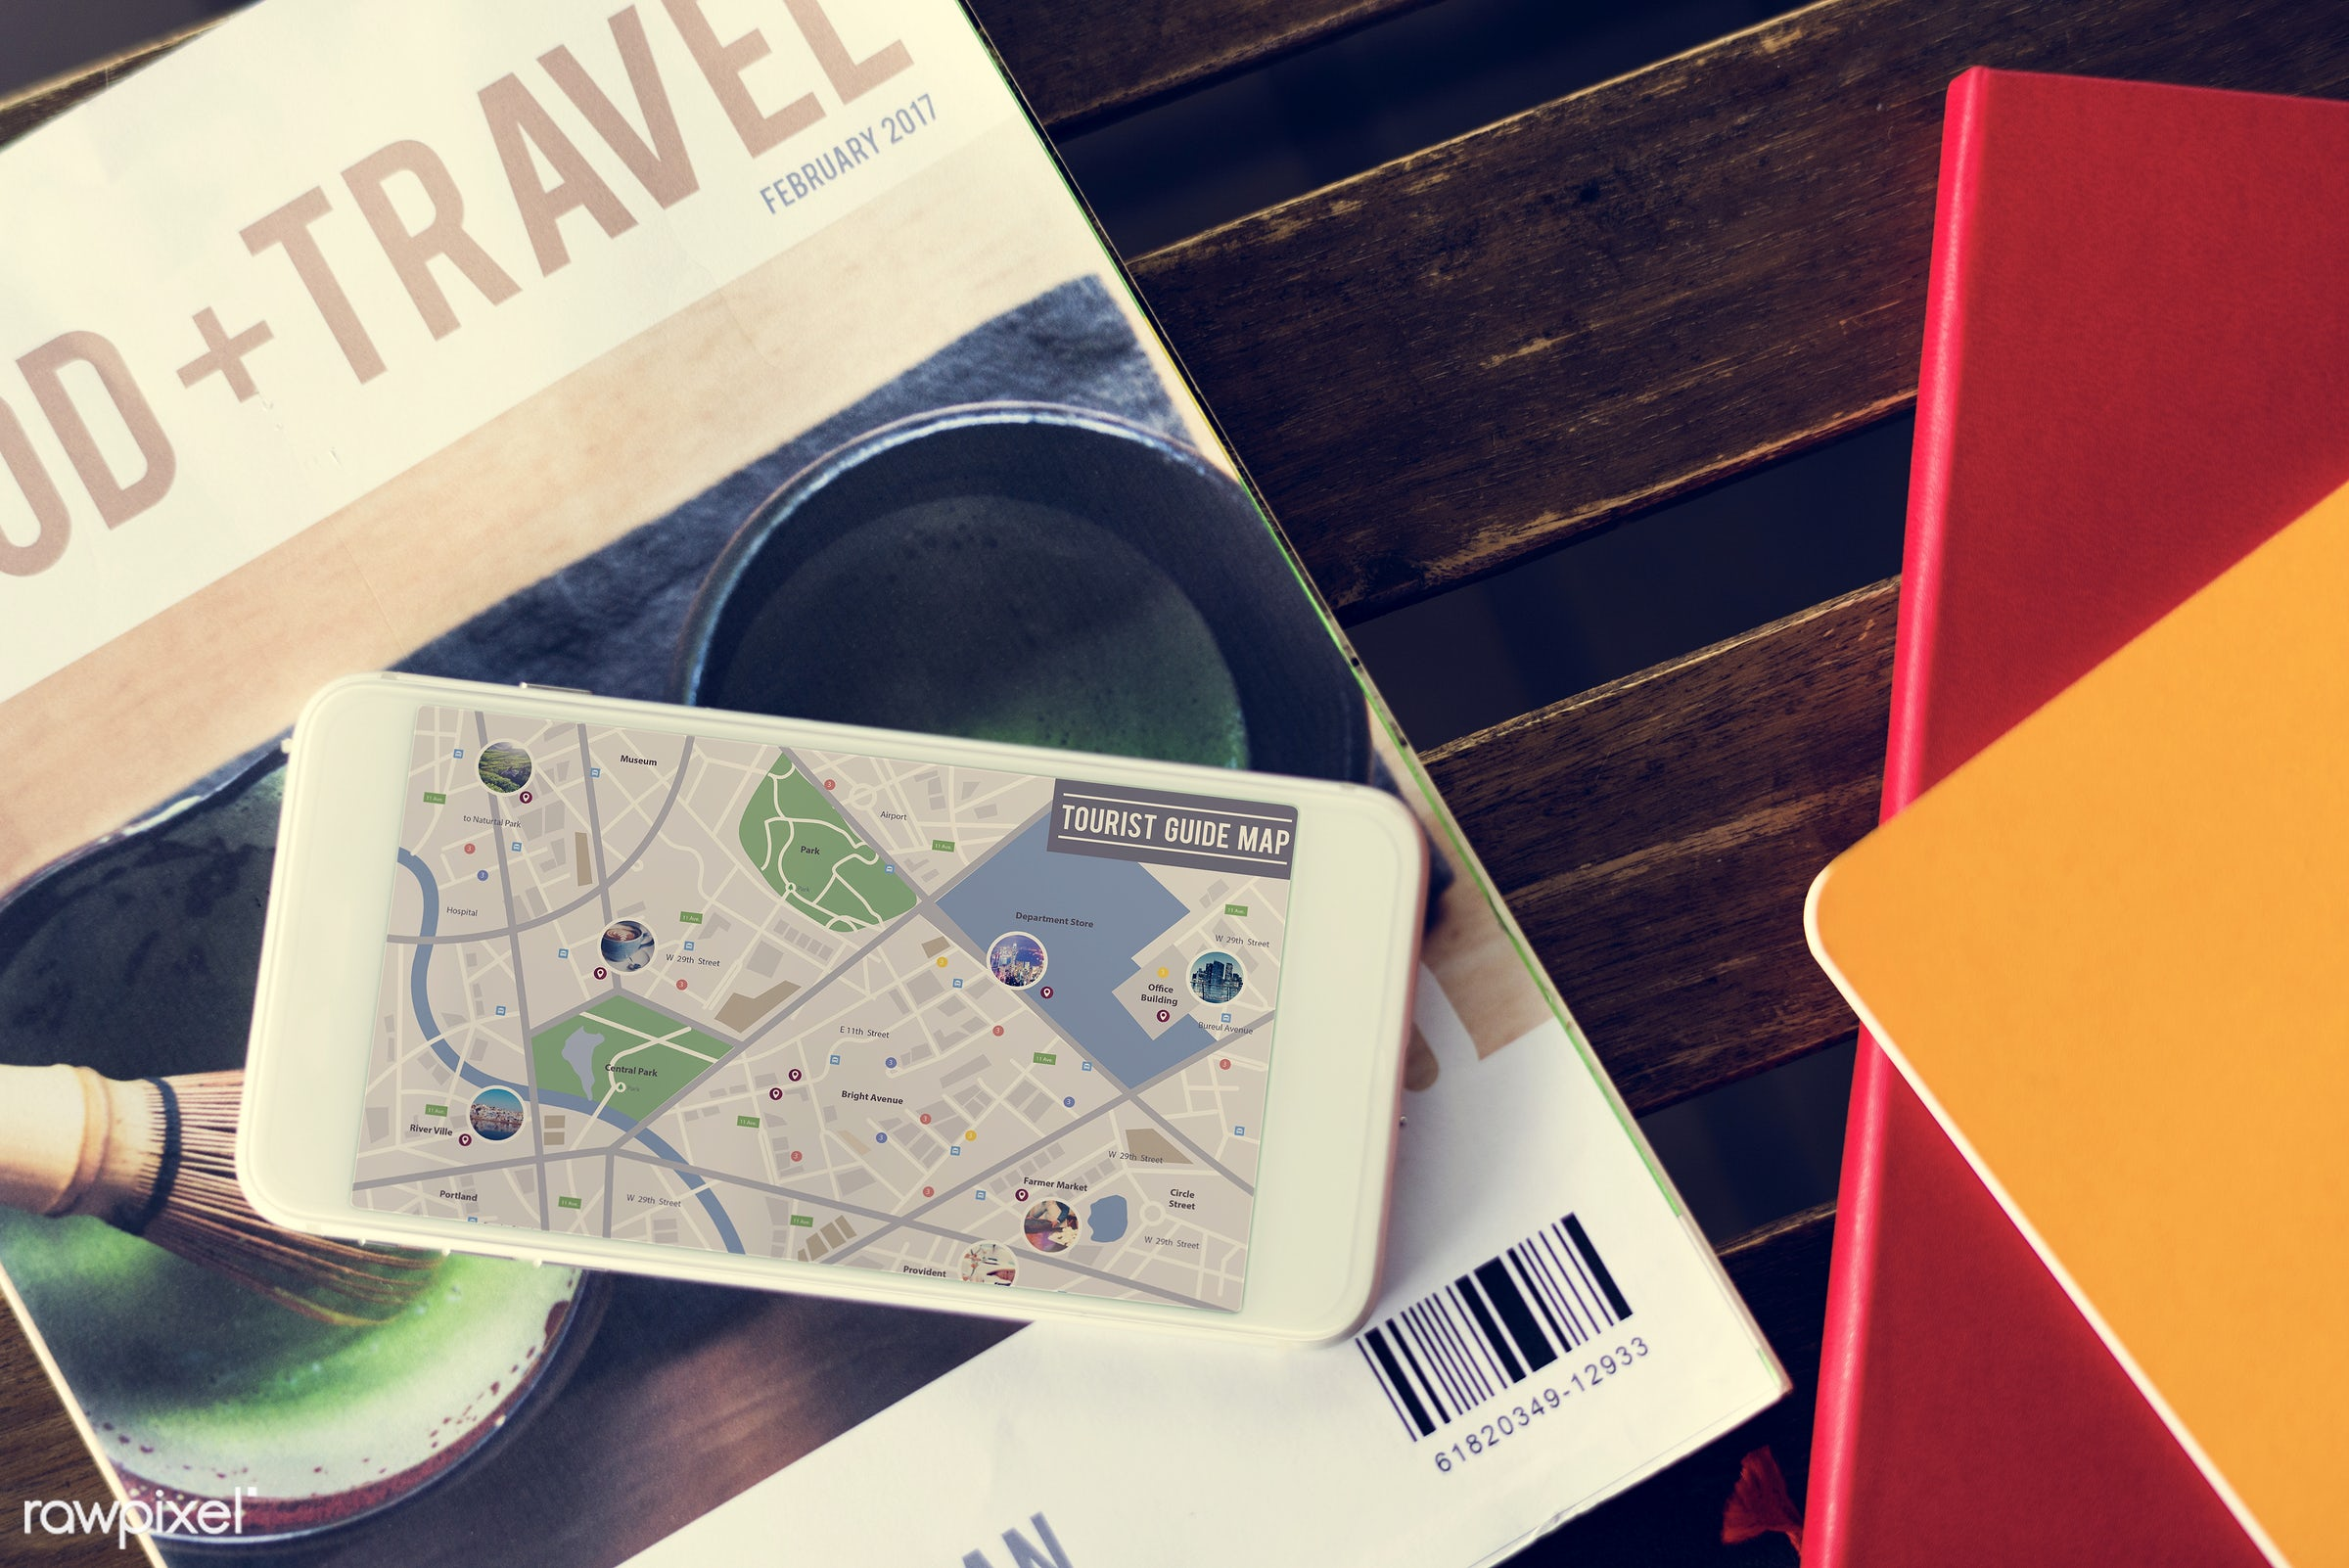 map, magazine, location, navigation, smartphone, mobile, phone, wireless, device, digital, desk, closeup, guide